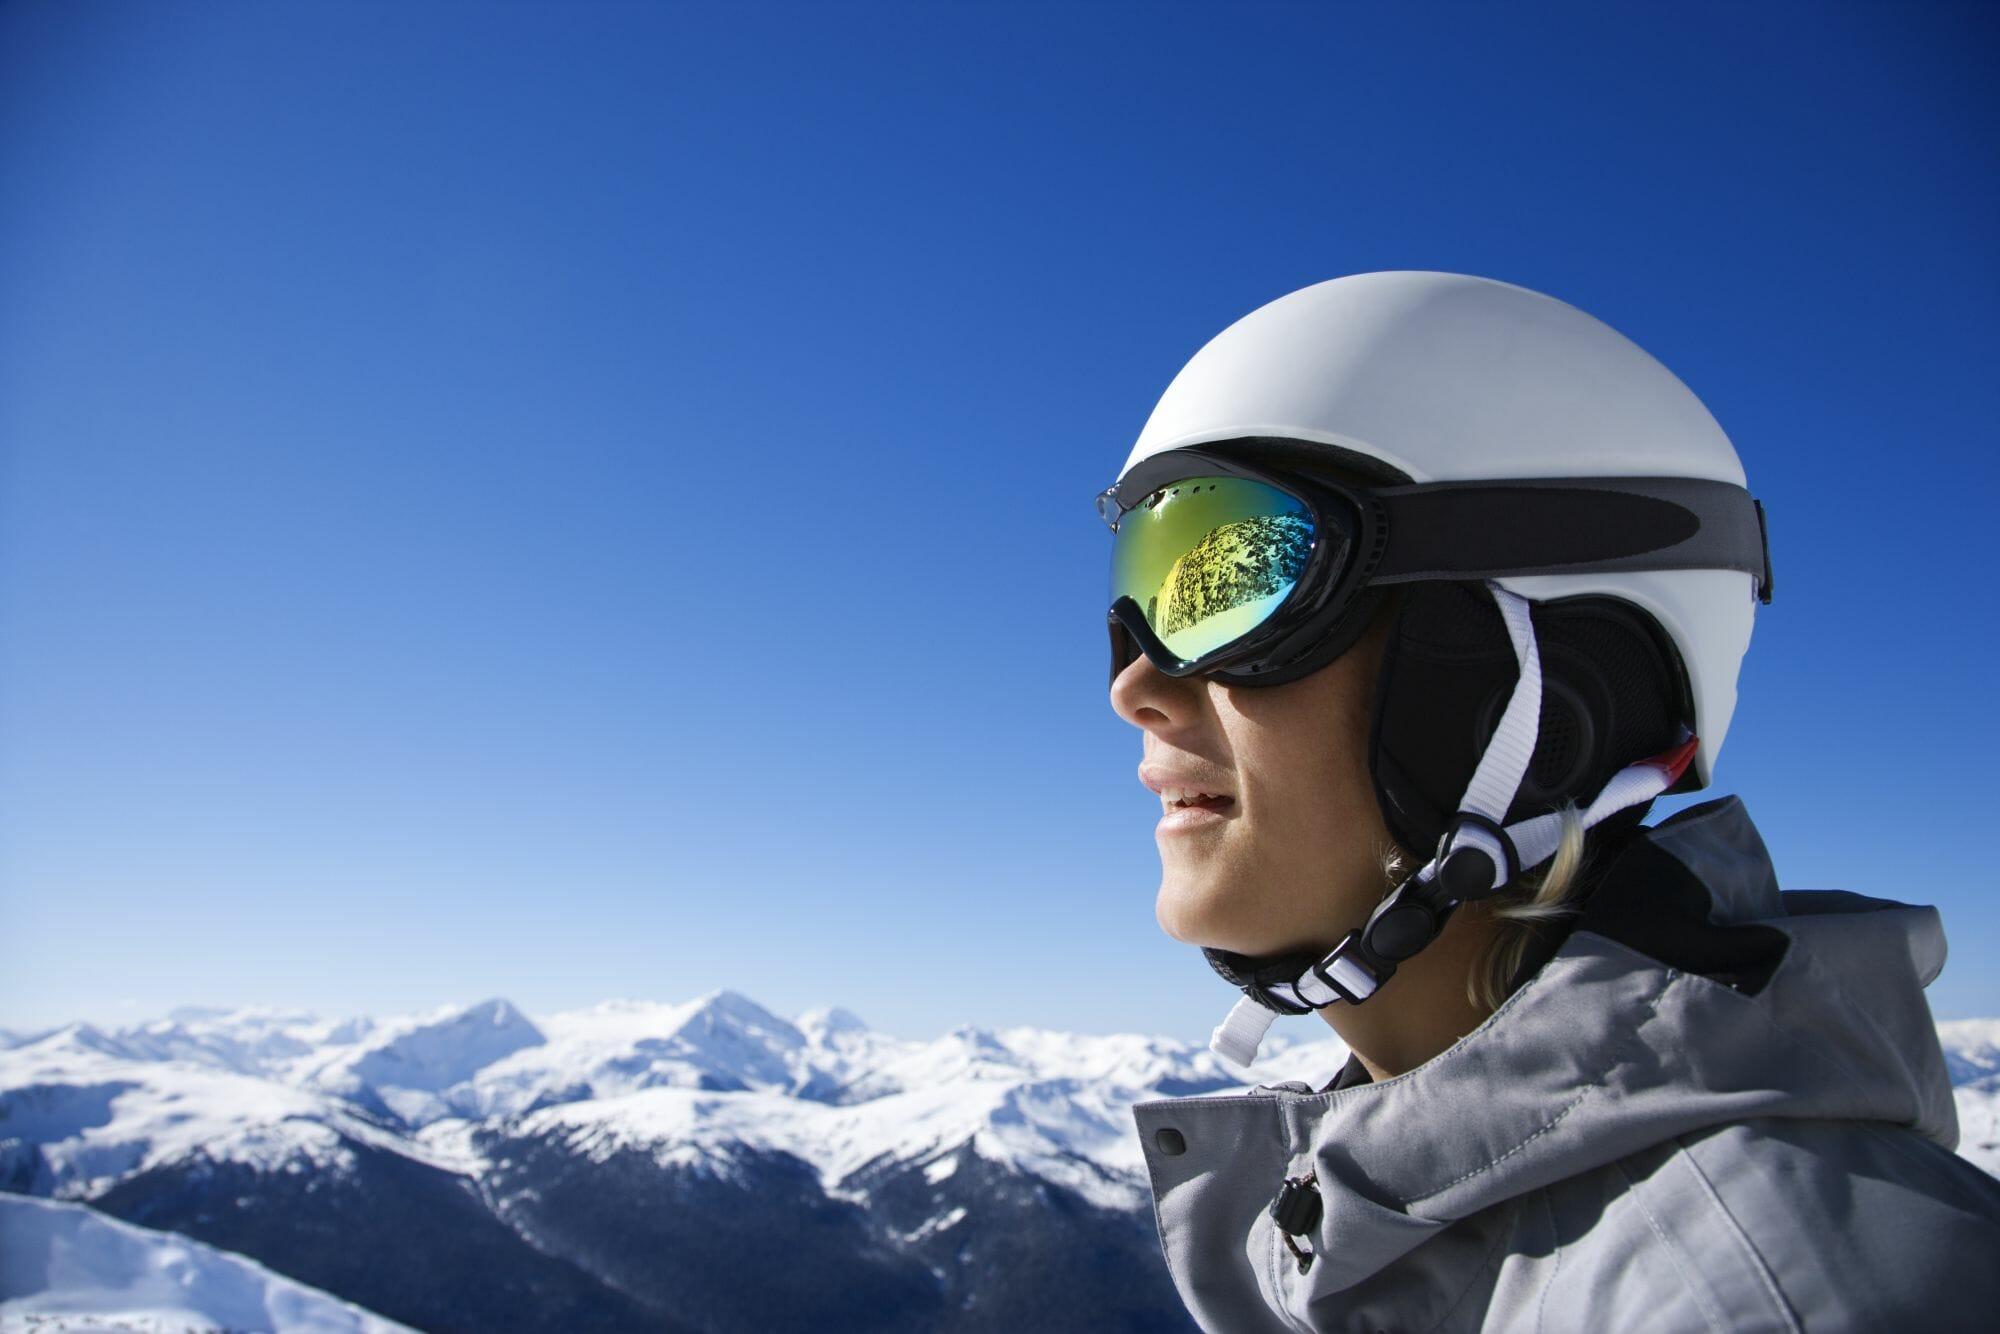 OZA Dr. Imke Fröhlich gesund sicher Skifahren web